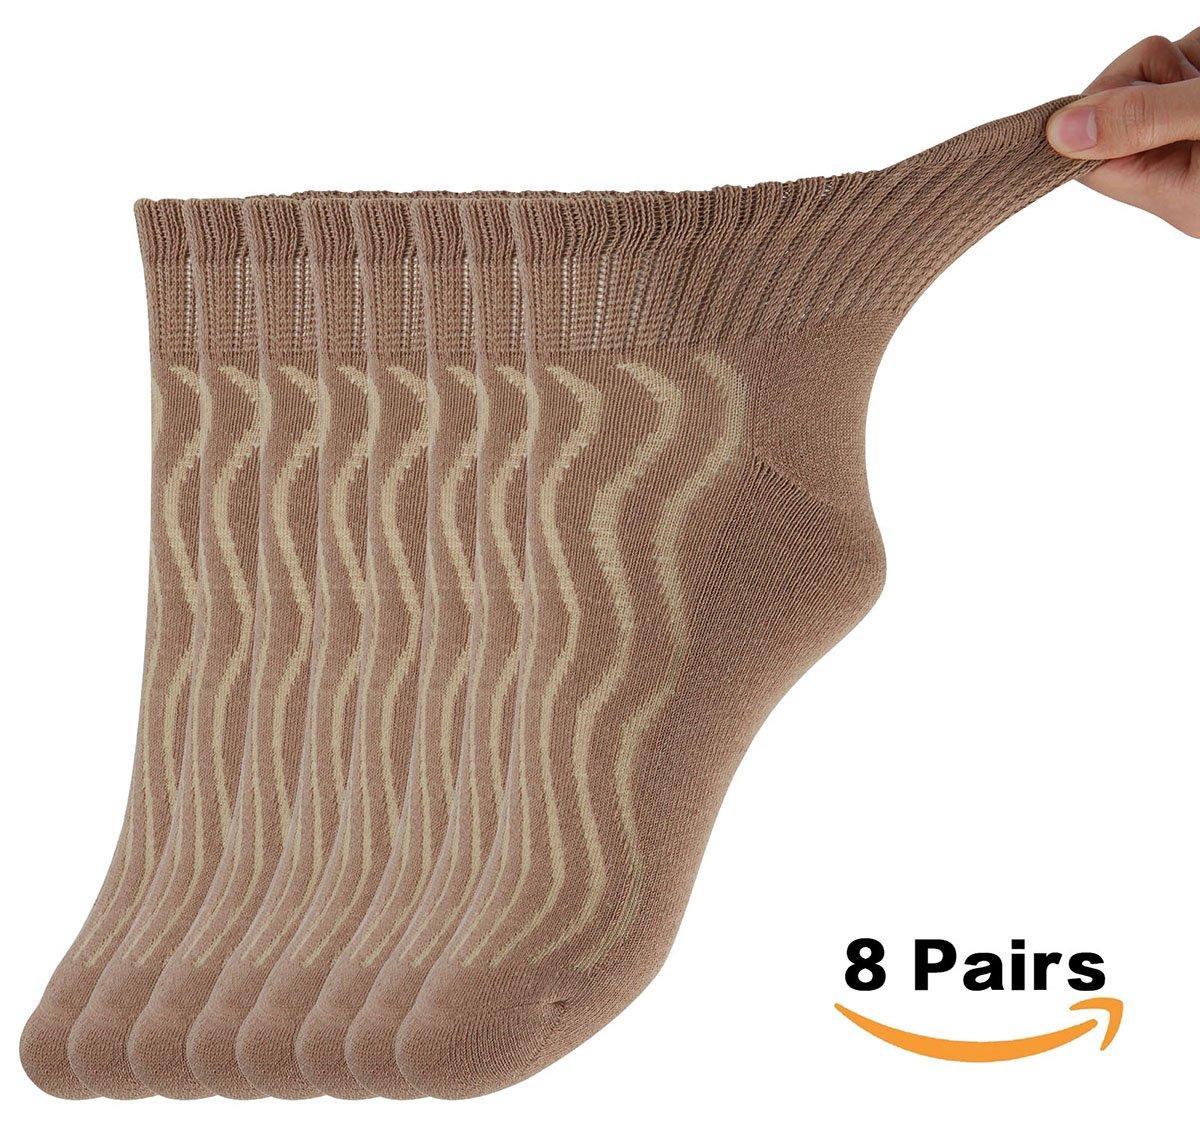 MD Unisex Diabetic Socks Half Cushion Breathable and Antibacterial Cotton Socks Quarter Length 8 Pack 10-13 Brown